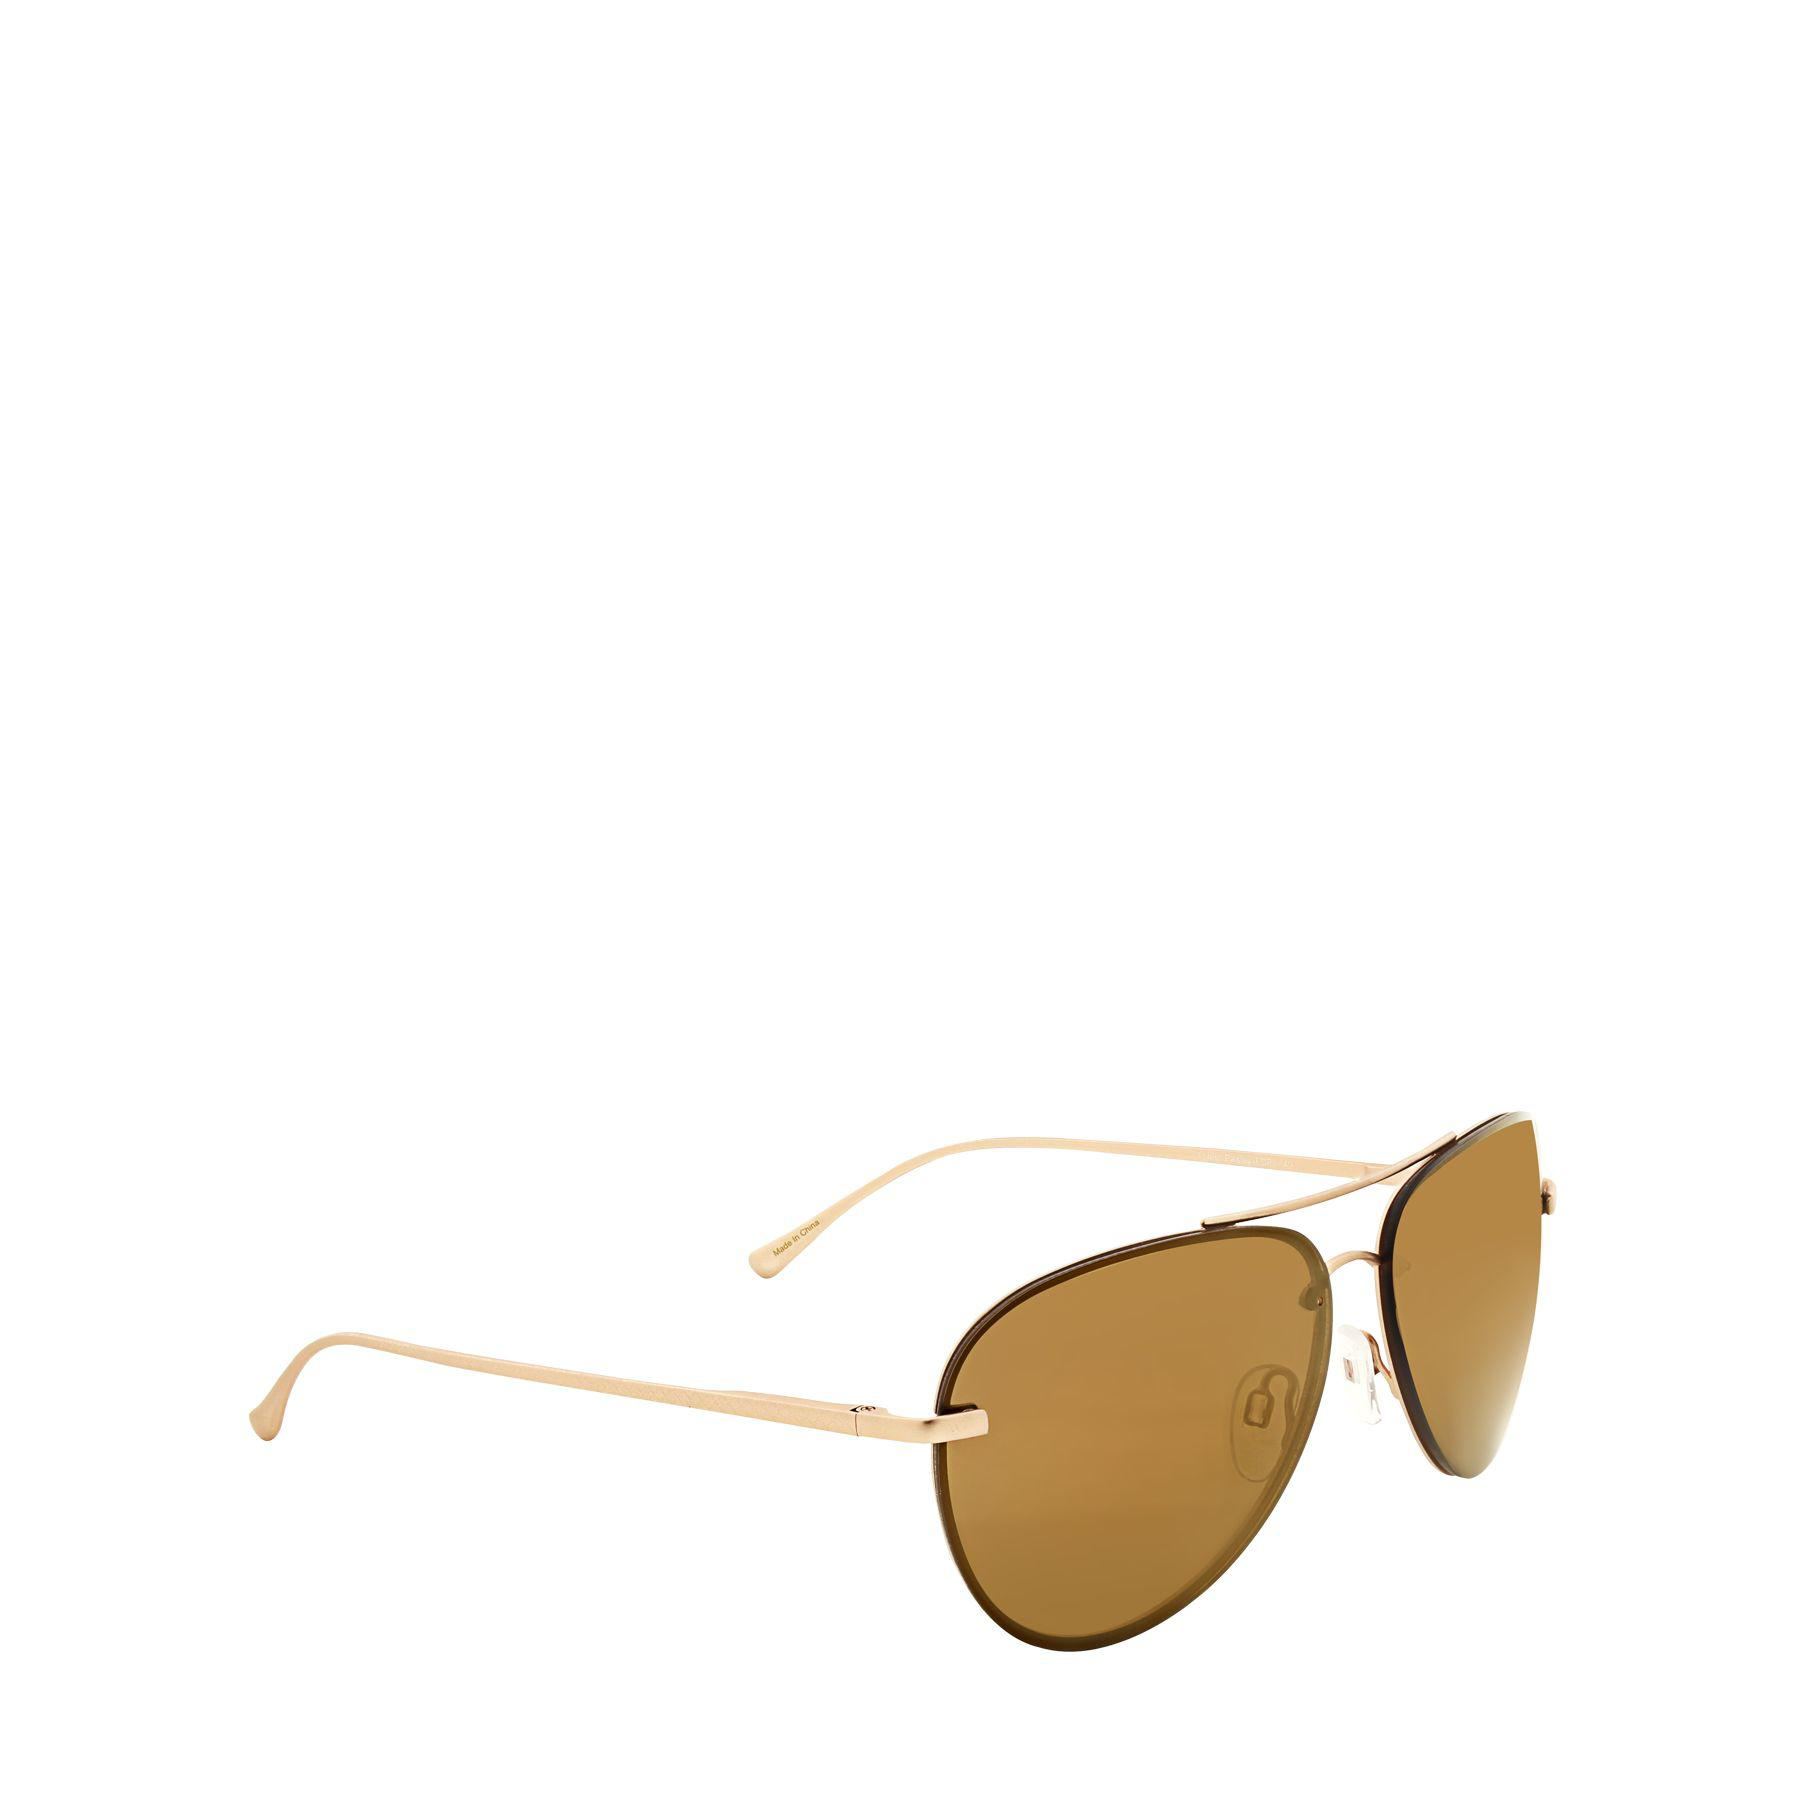 3c9b7d7150 Lyst - Vera Bradley Deanna Polarized Aviator Sunglasses